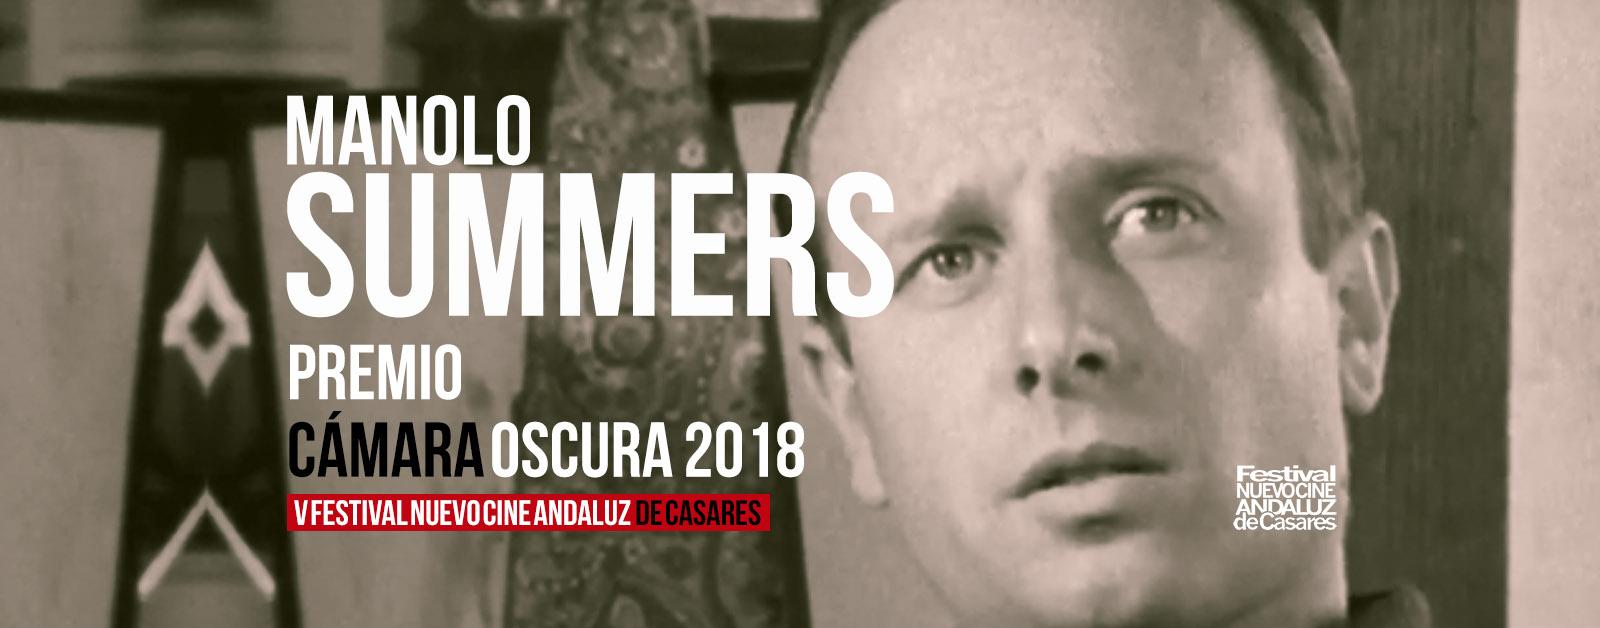 Manolo Summers, premio Cámara Oscura 2018